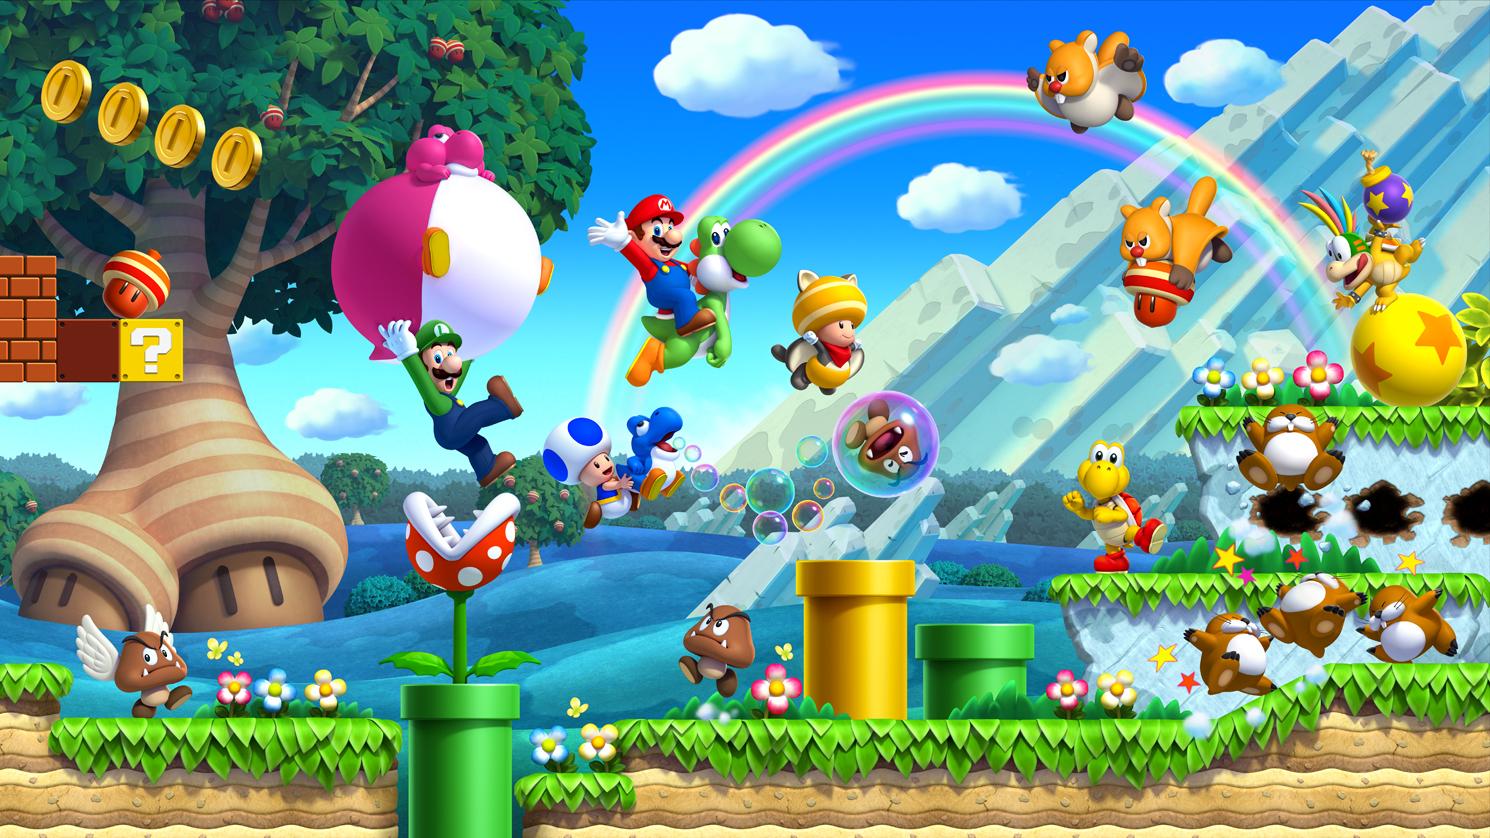 OPINION - Nintendo needs a